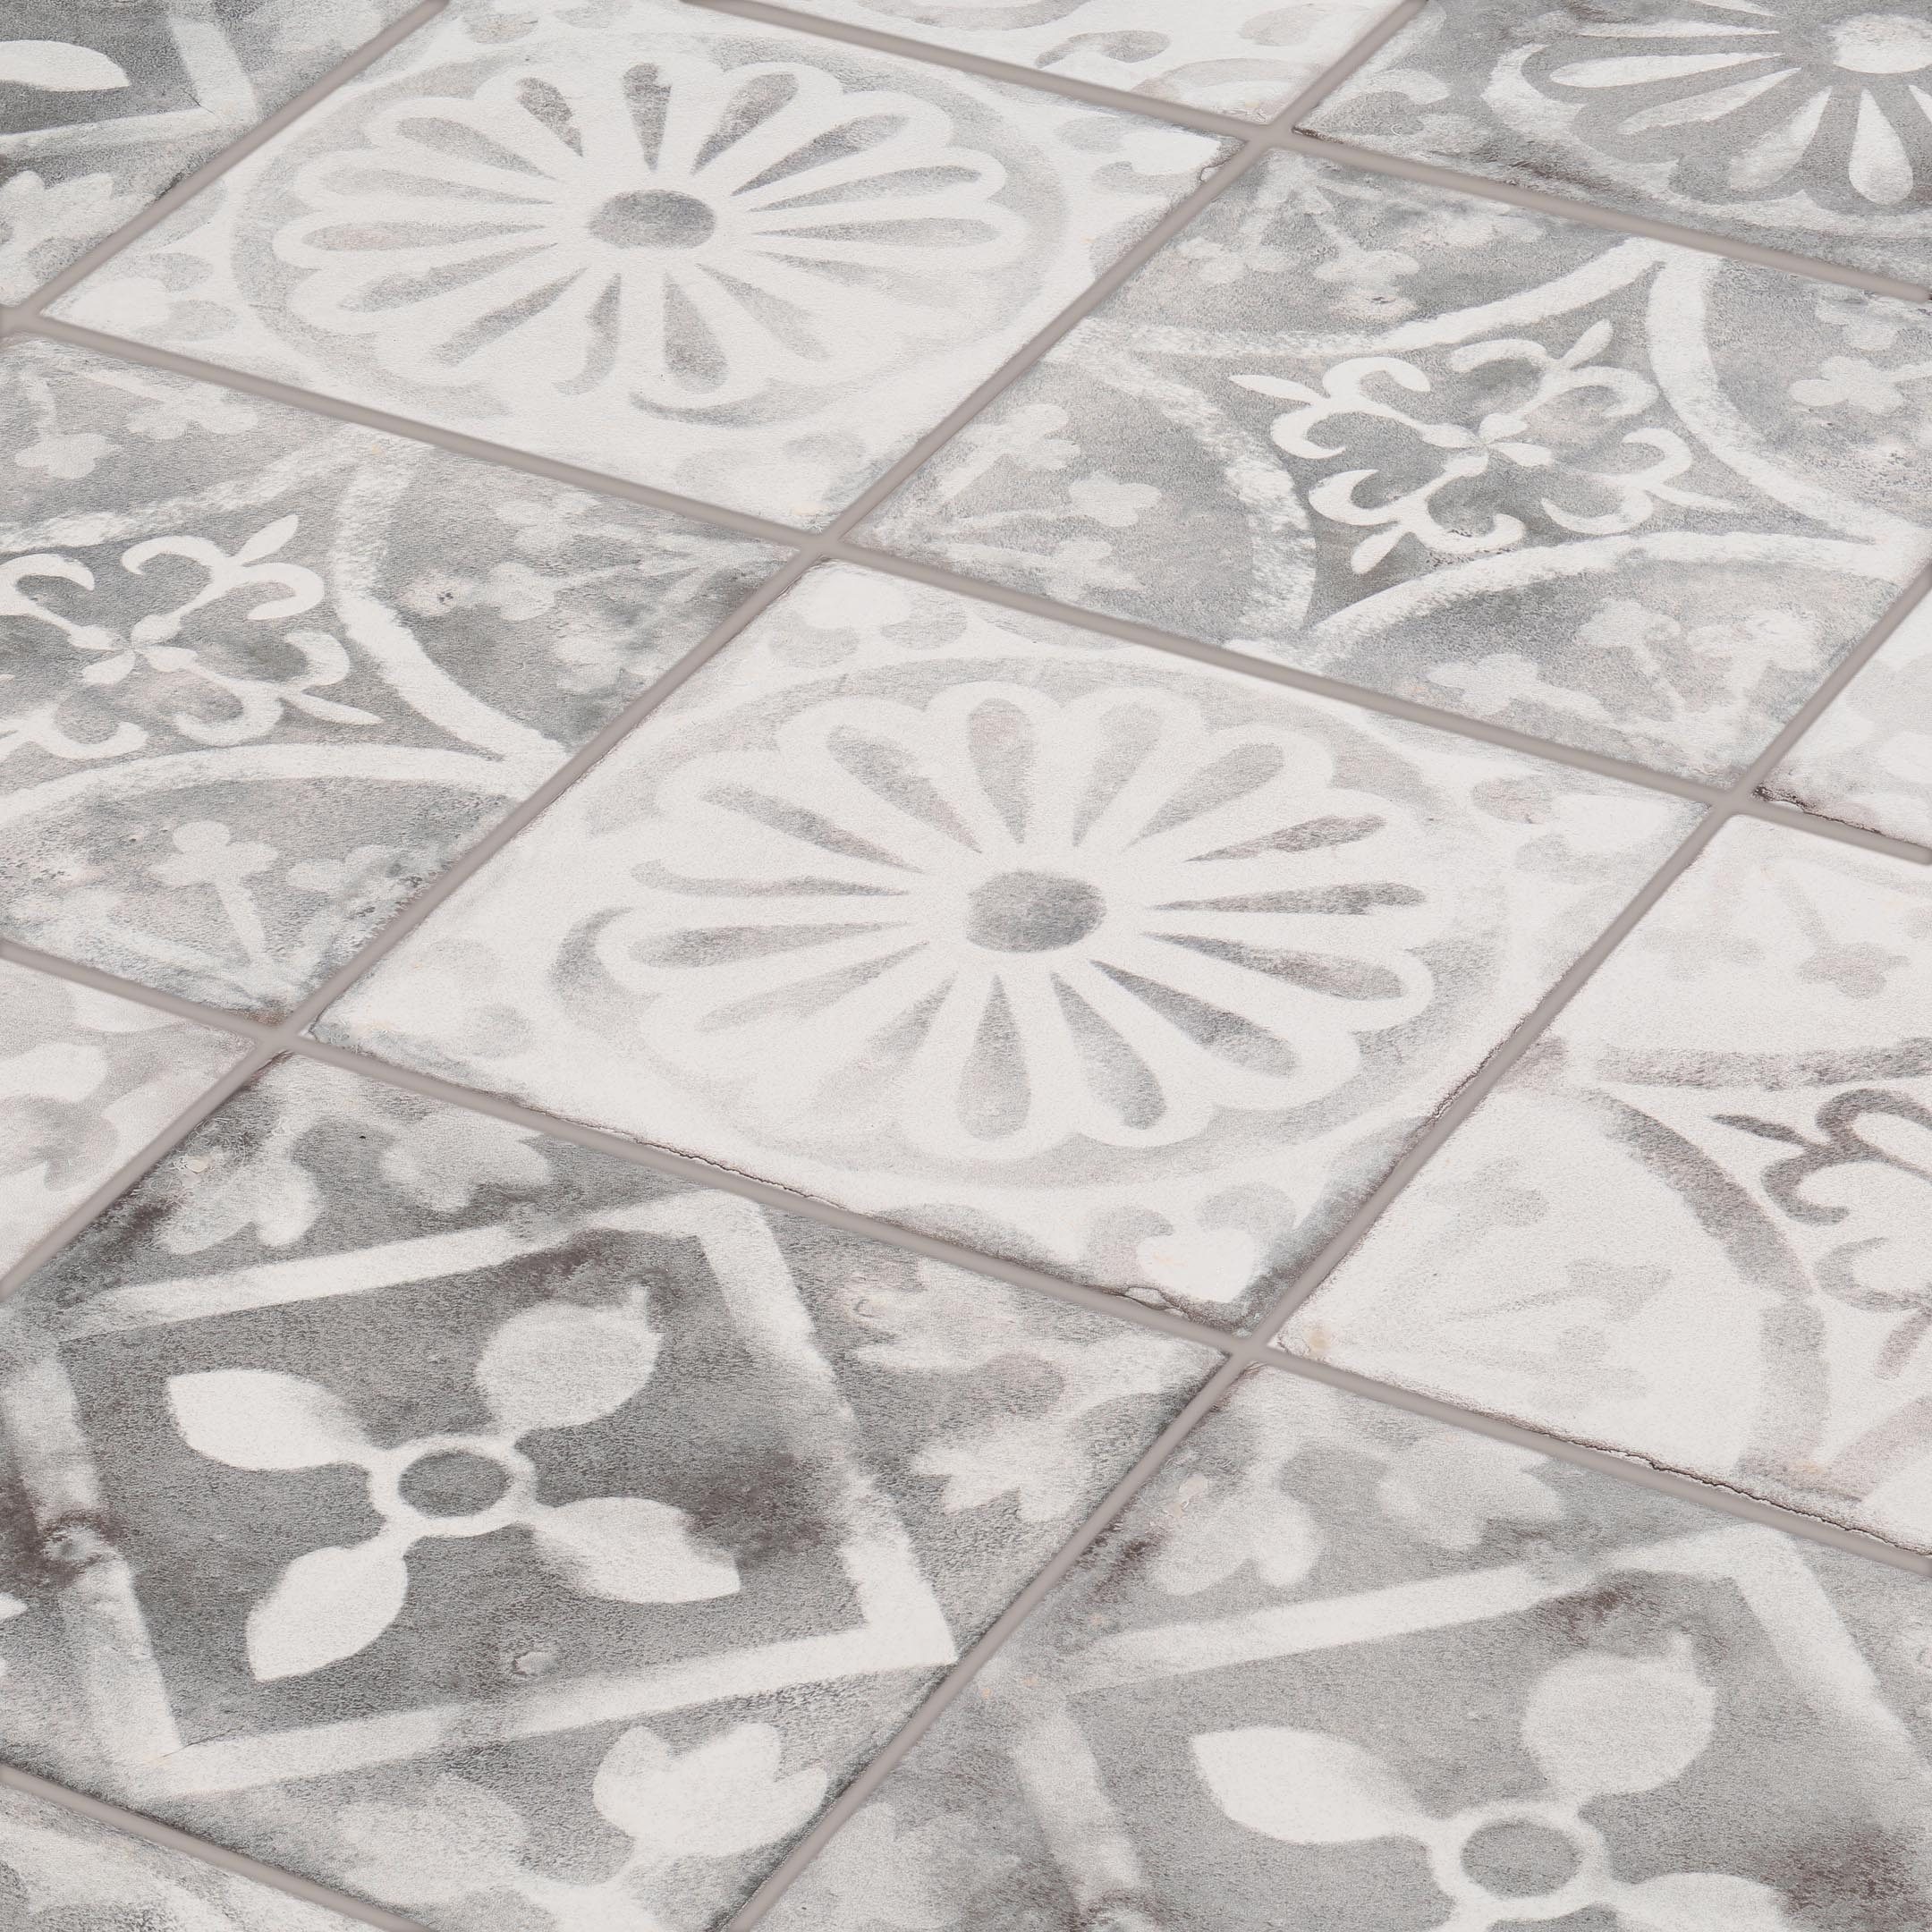 Плитка облицовочная Керамин Гранада 1Д серый микс 200x200x7 мм (26 шт.=1,04 кв.м) плитка облицовочная керамин гранада 1с серый 200x200x7 мм 26 шт 1 04 кв м